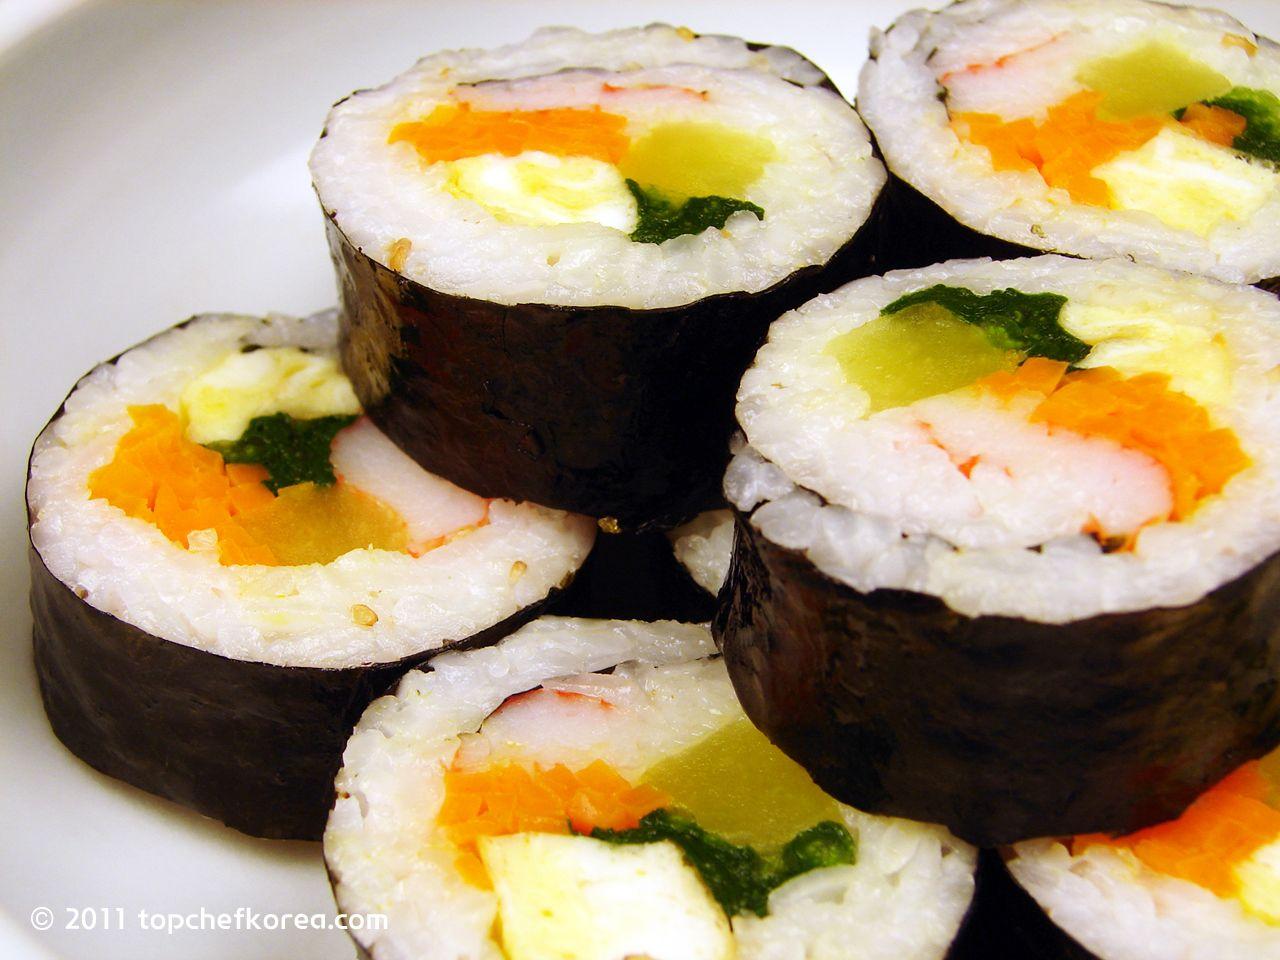 Korean snack recipes top chef korea authentic korean snack recipes top chef korea authentic forumfinder Gallery